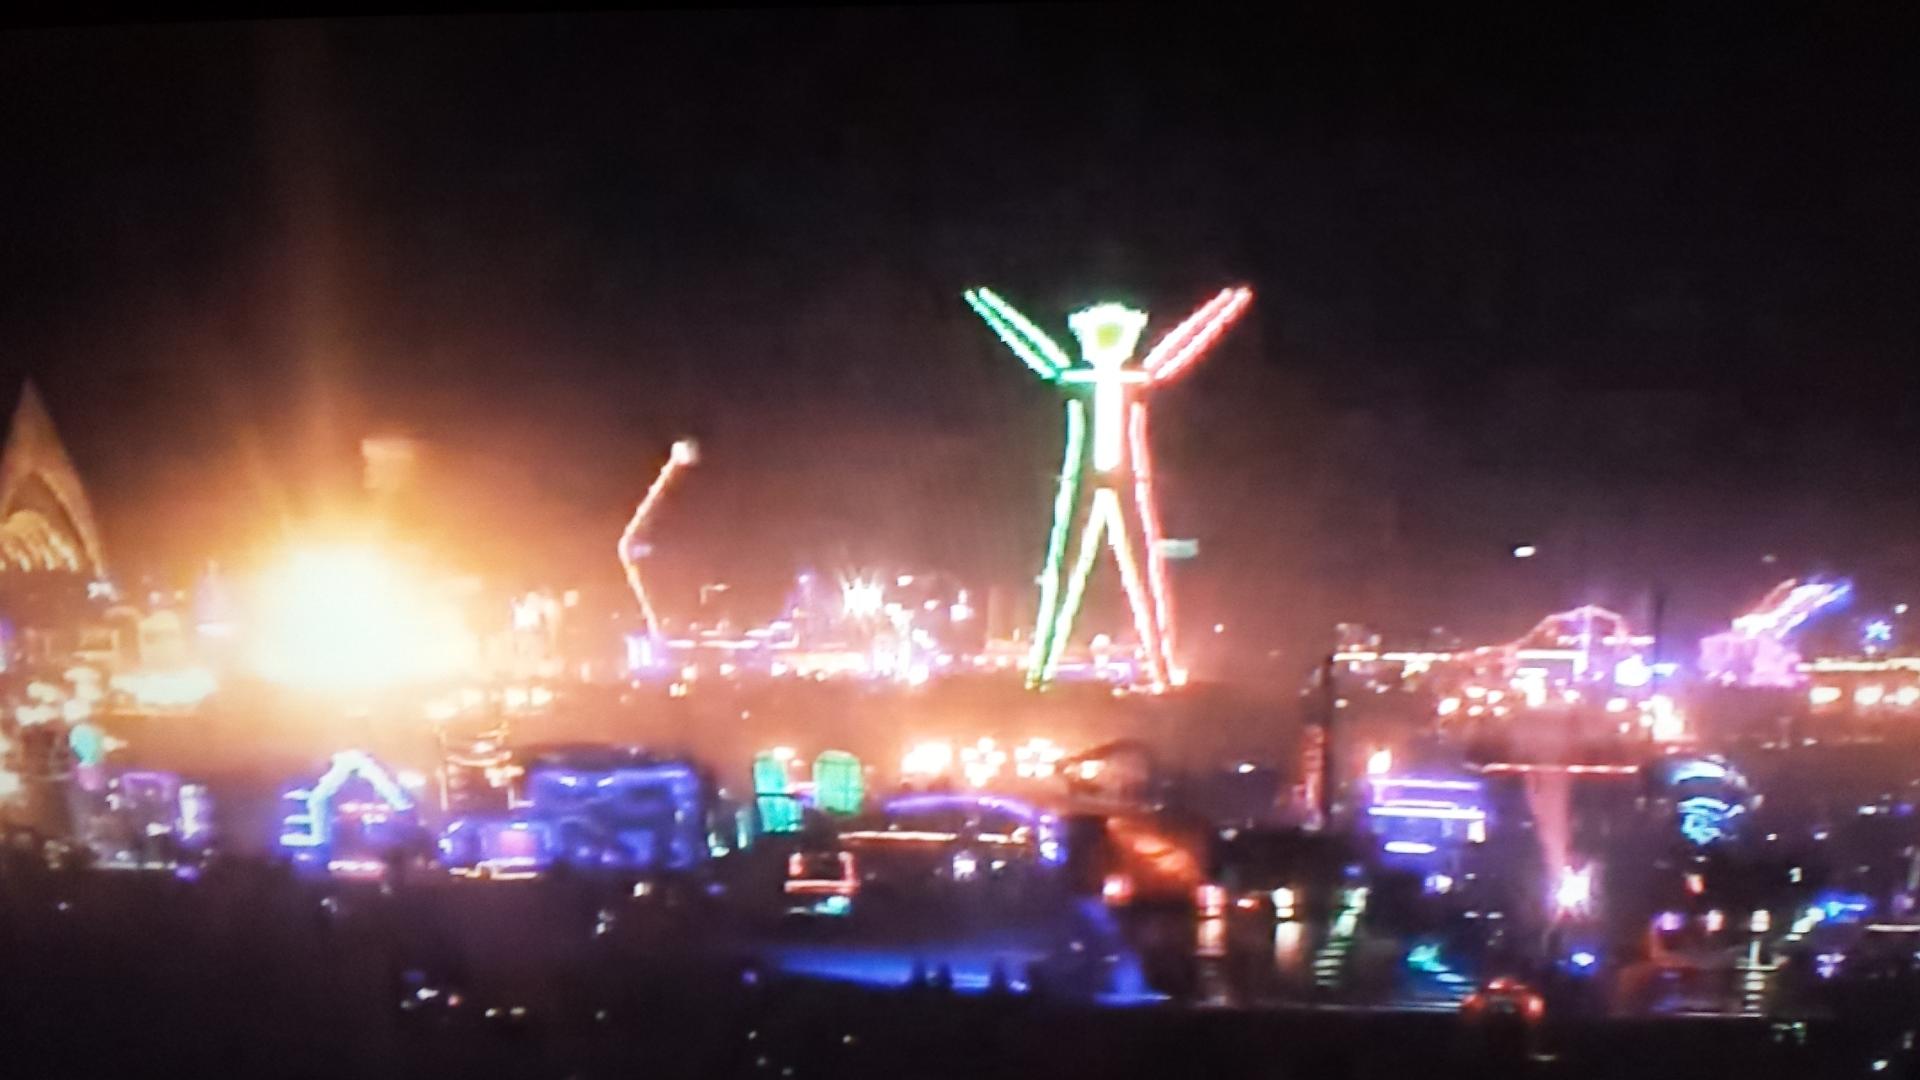 FiberFlies Pixel Whip Light Up LED Whip EmazingLights